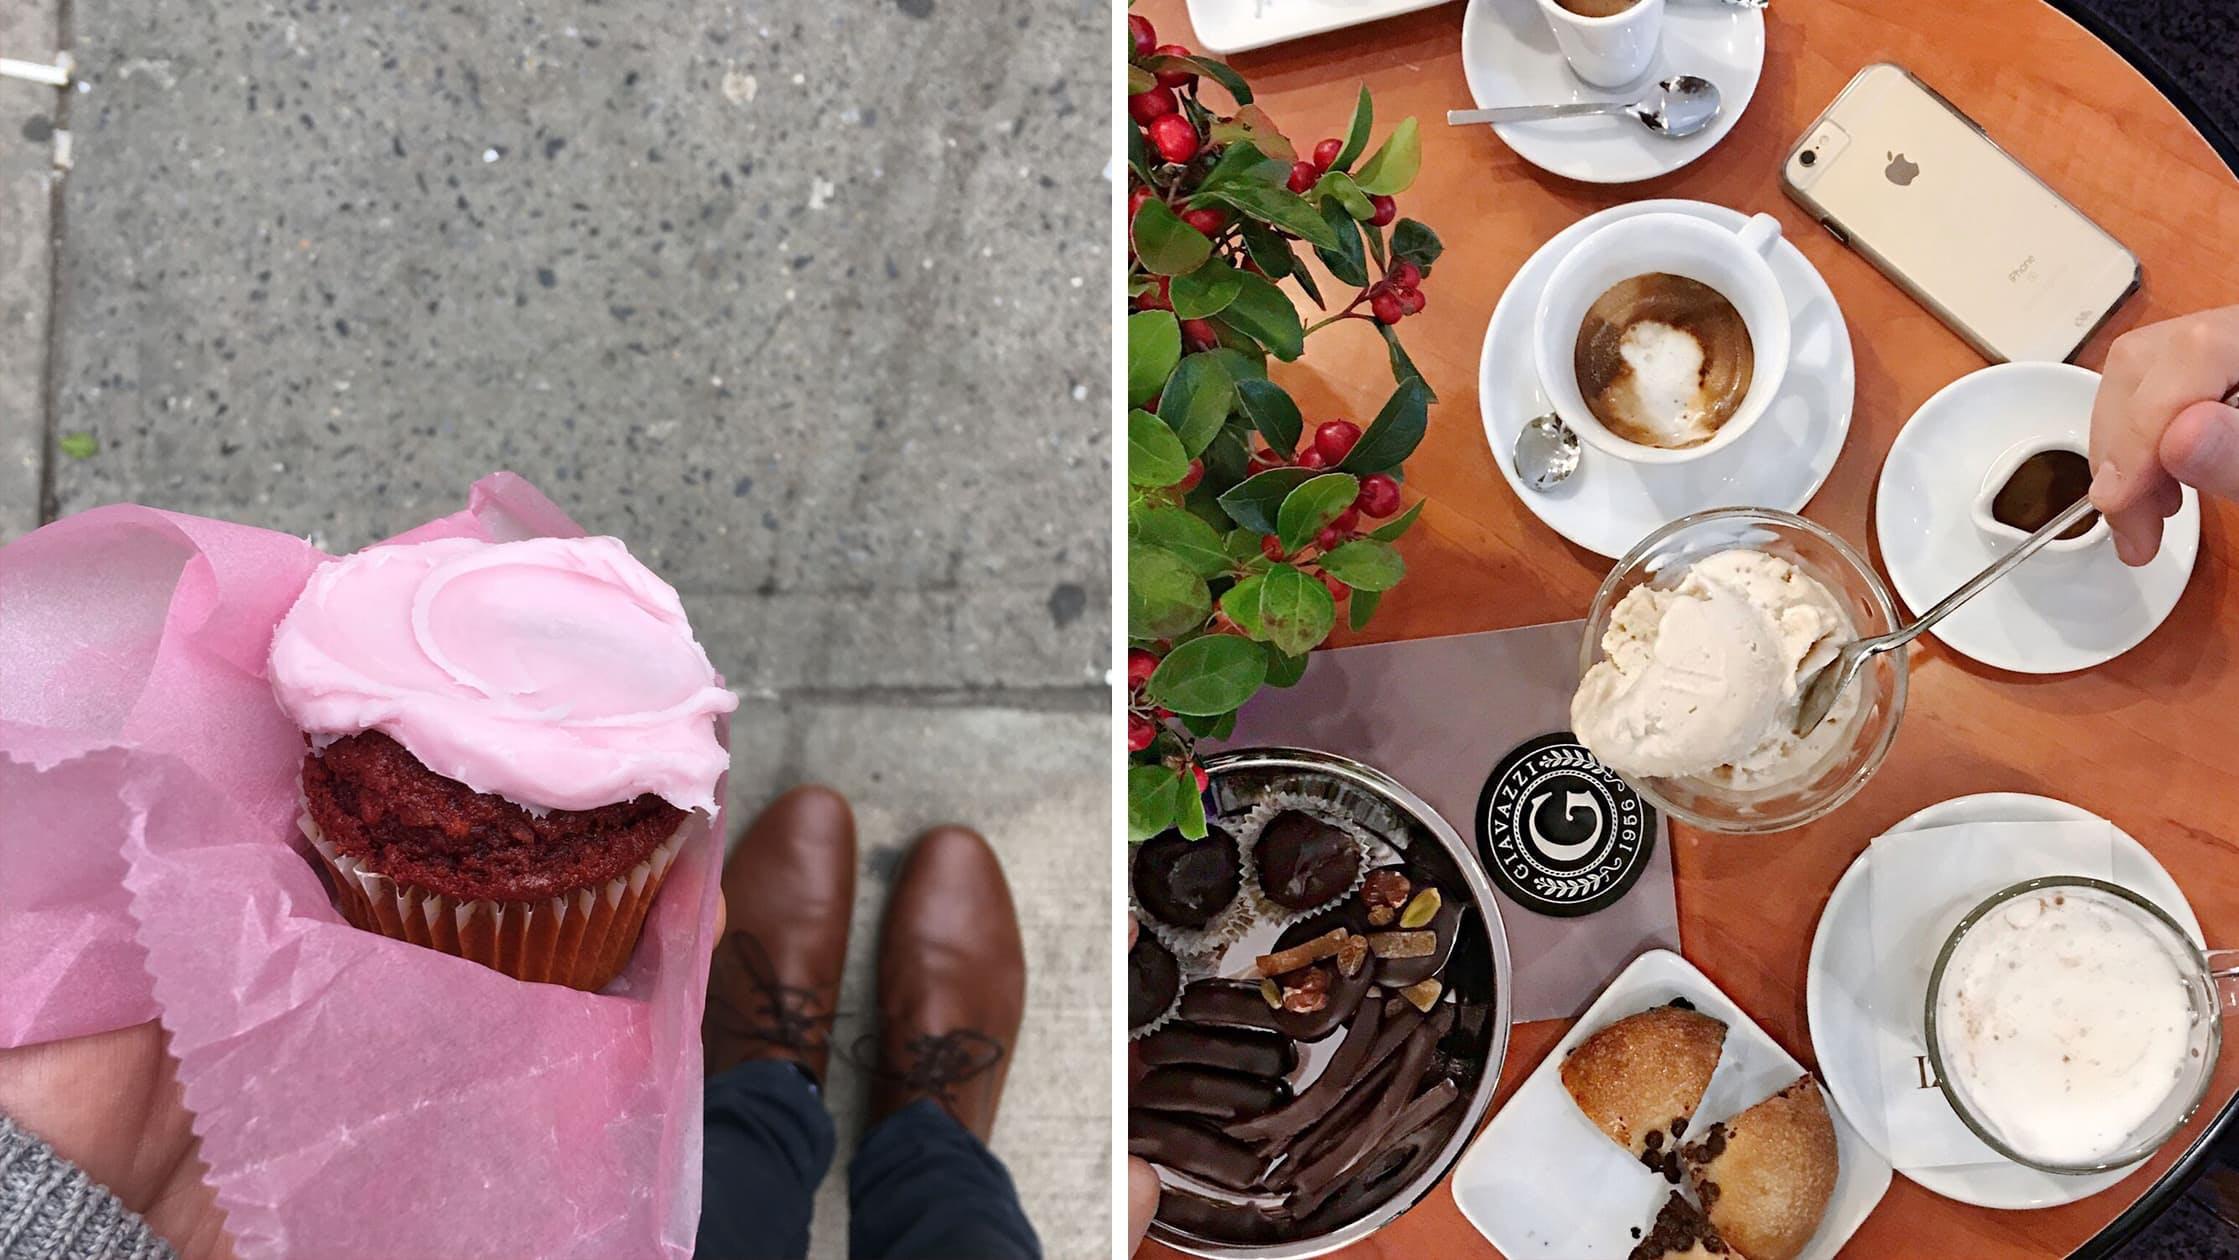 Left: Vegan Cupcake & Shoes in Berlin, Germany | Right: Vegan Dessert in Rivolta d'Adda, Italy